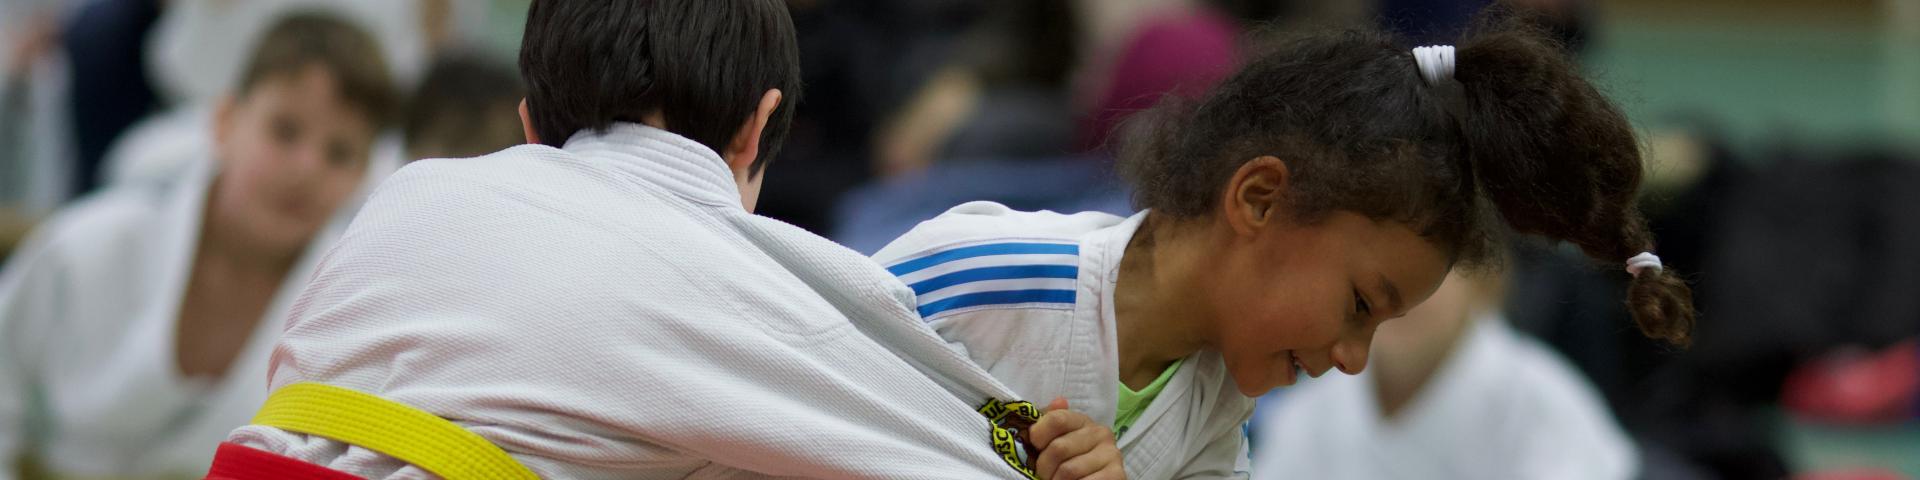 Halterner Judo-Club 66 e.V.